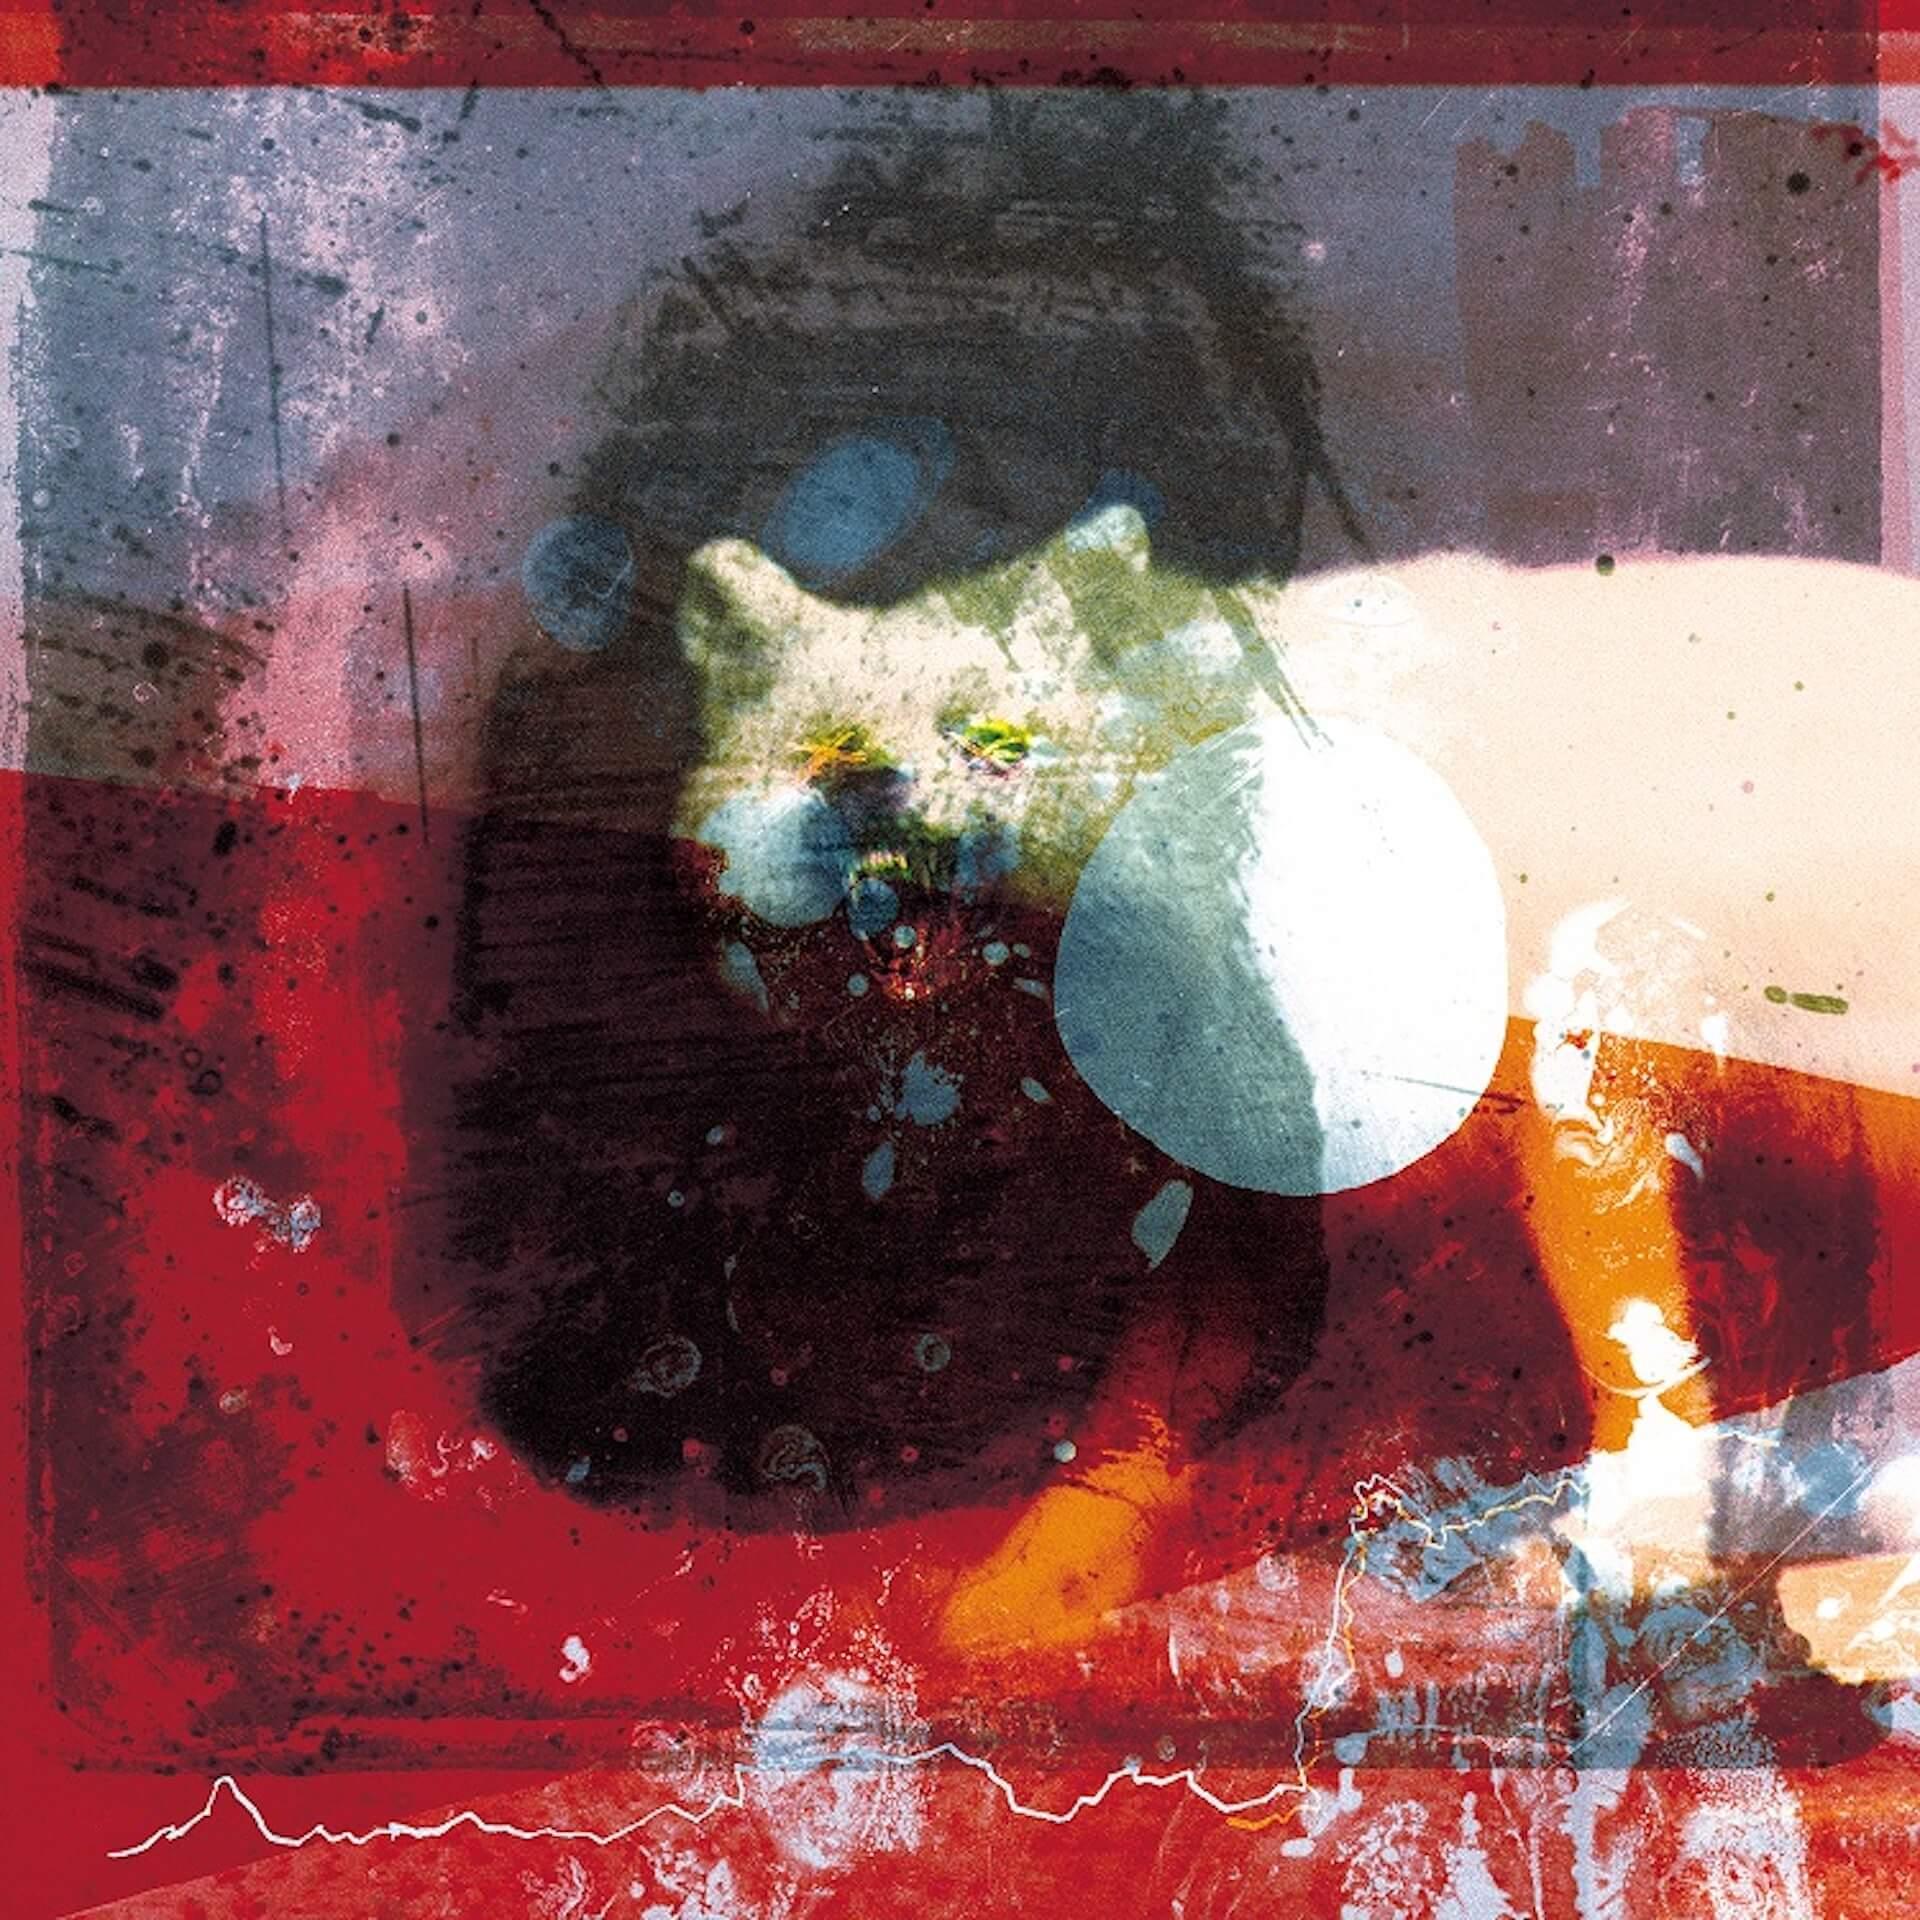 Mogwaiの3年半ぶりのニューアルバム『As The Love Continues』がリリース決定!先行配信曲のMVも公開 music210113_mogwai-02